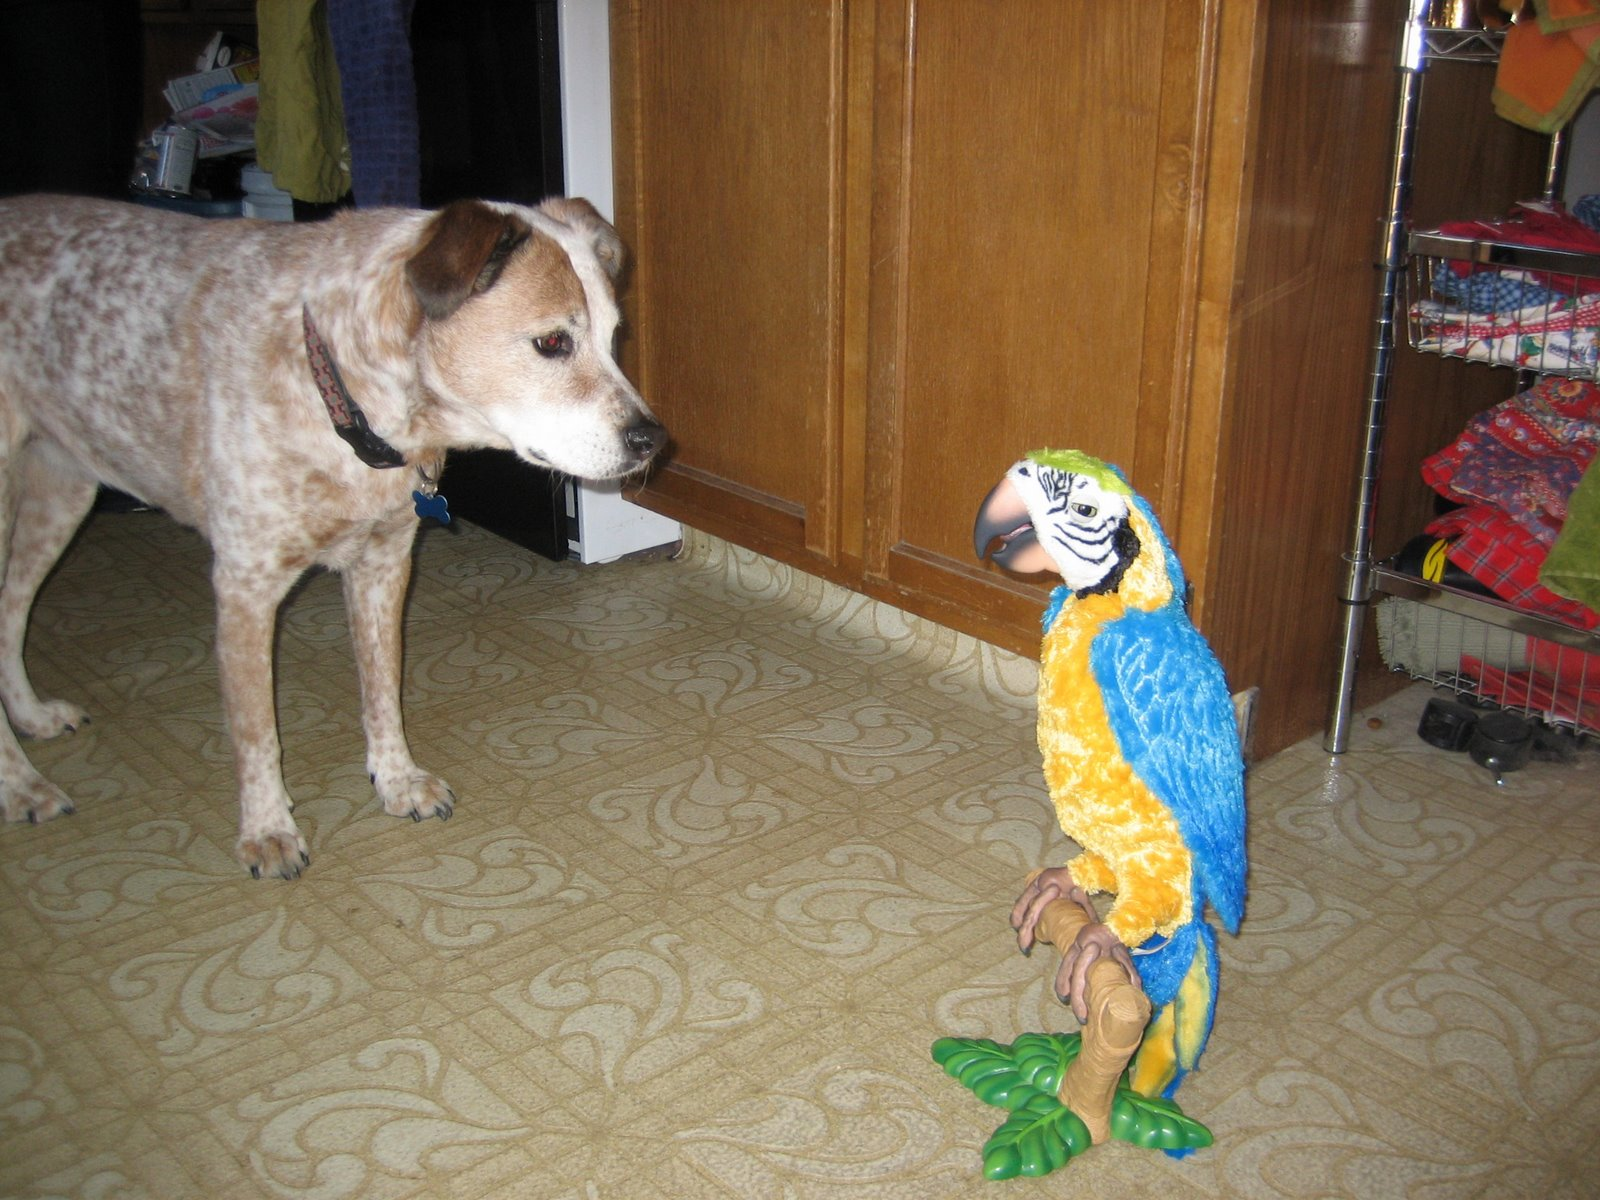 [squawk2]